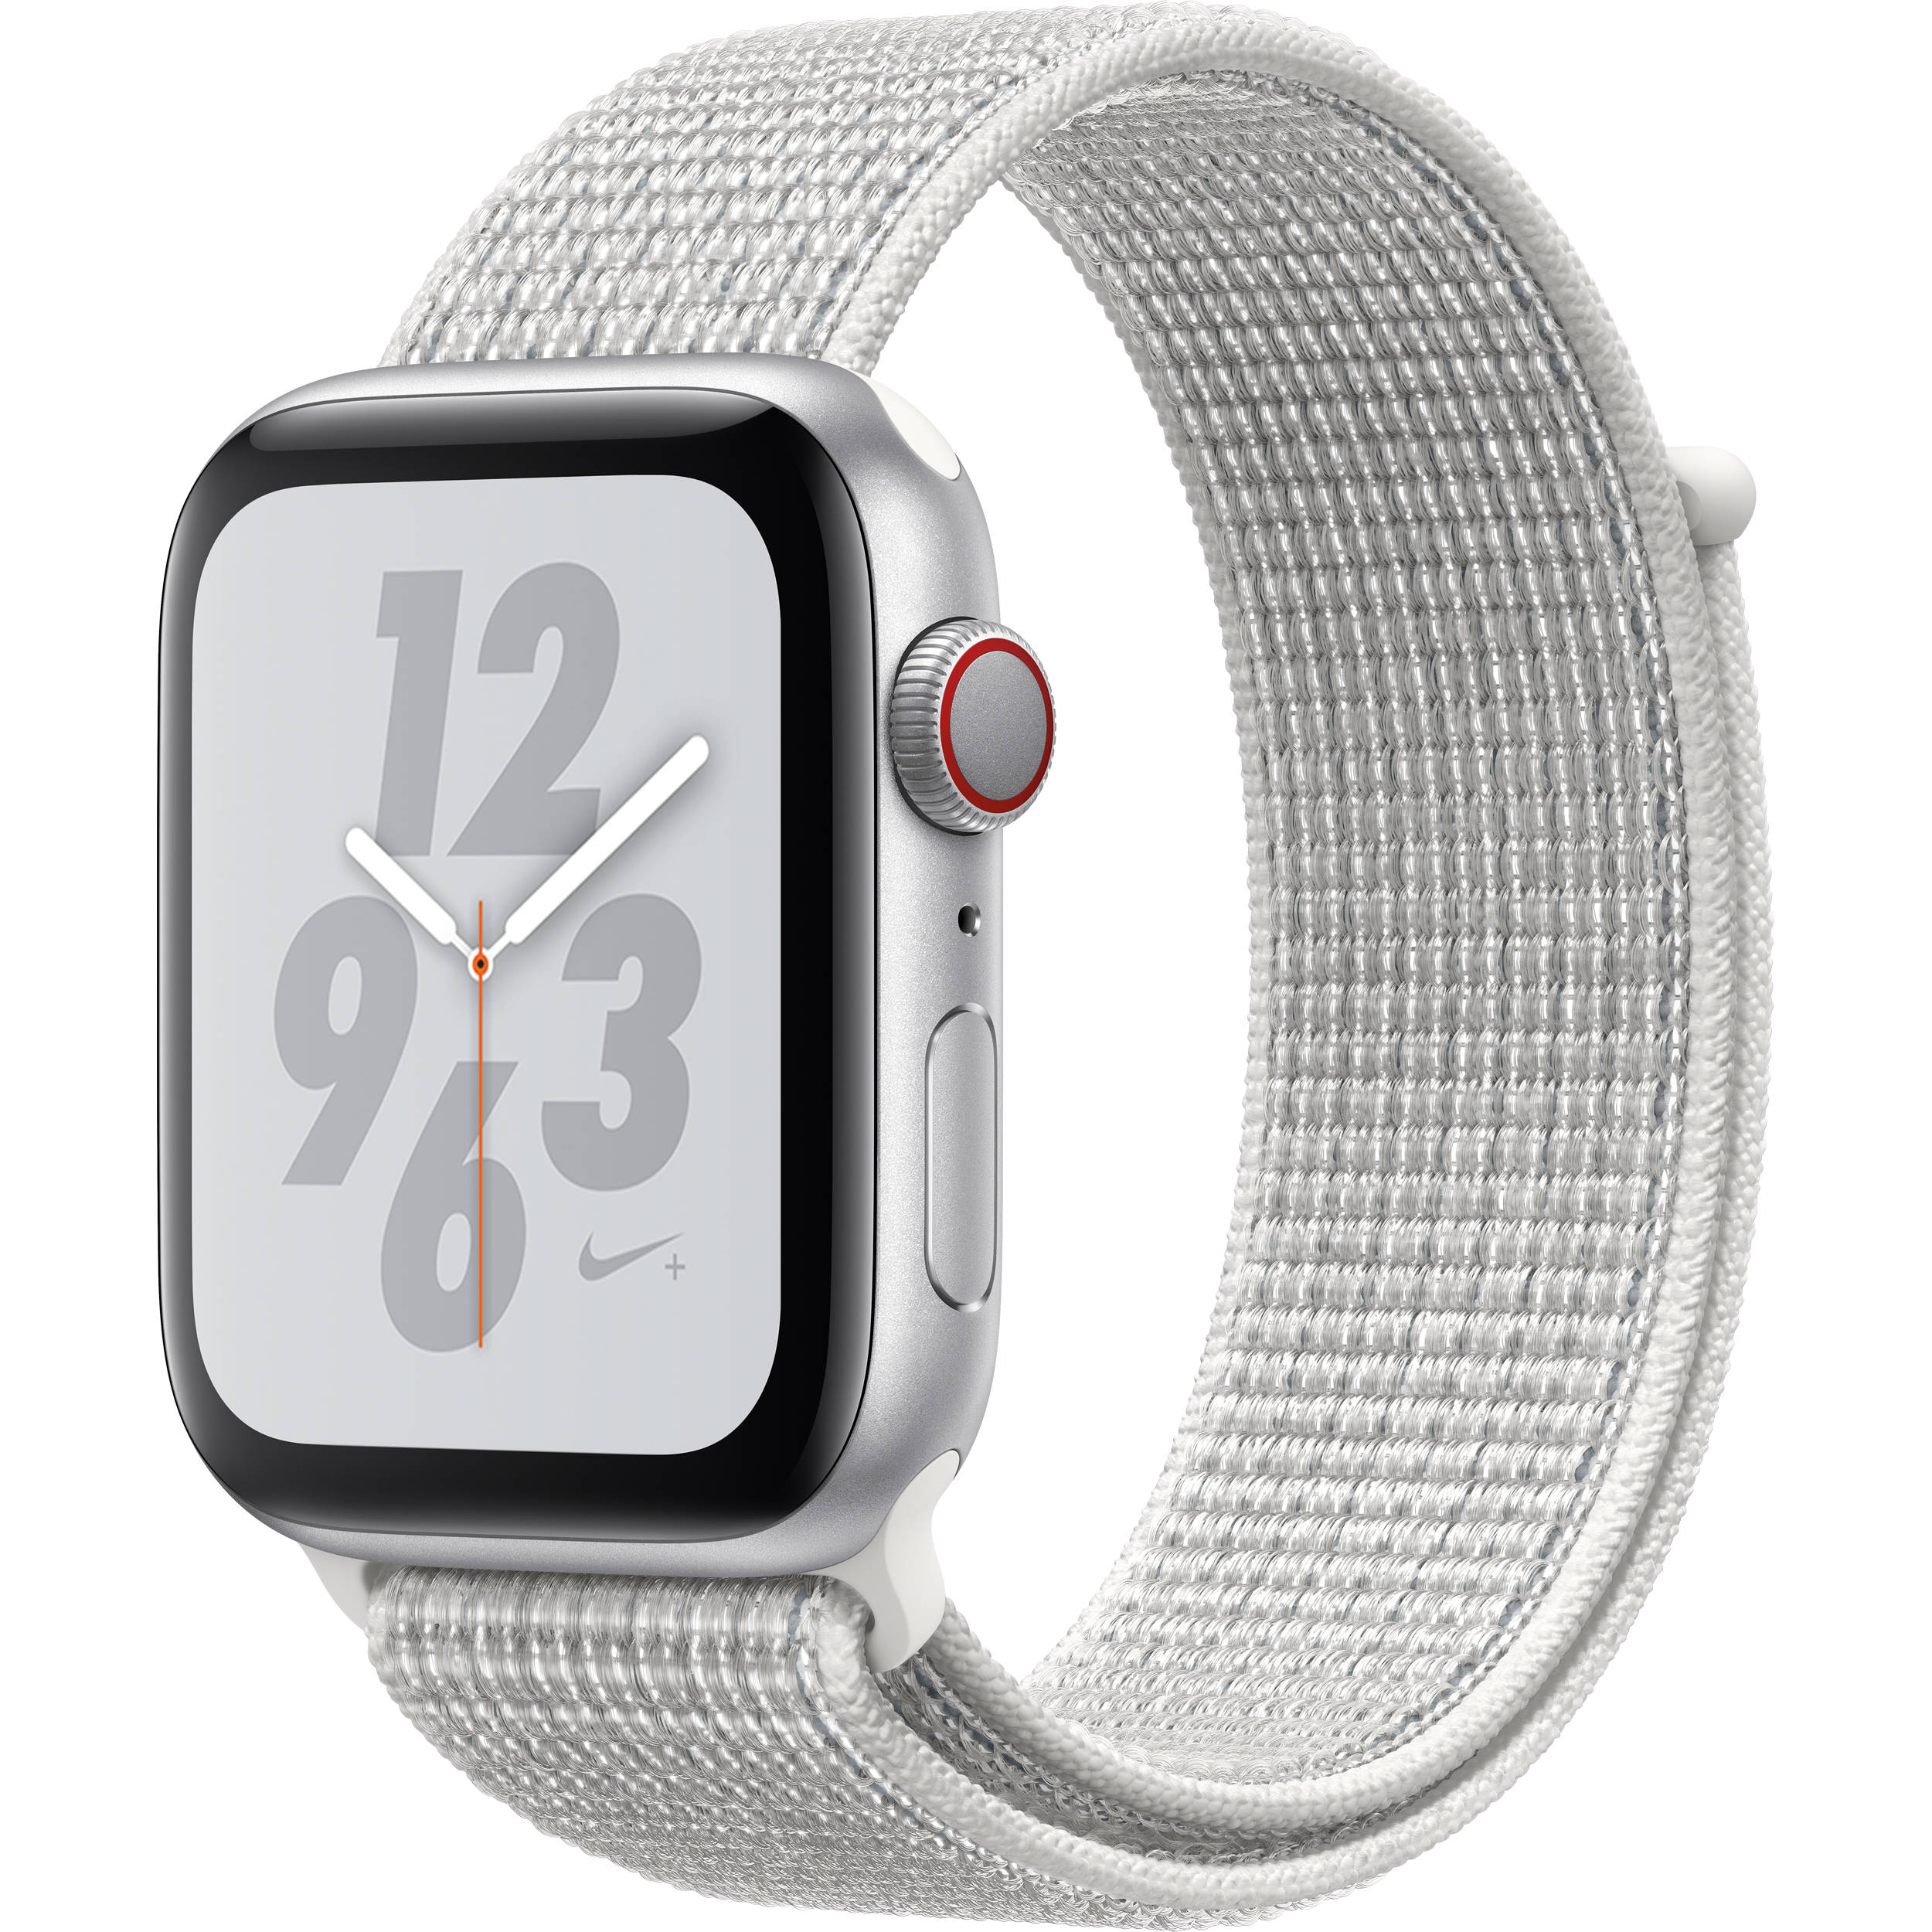 half off bcafa 2bec3 Apple Watch Nike+ Series 4 (GPS + Cellular, 44mm, Silver Aluminum, Summit  White Nike Sport Loop)